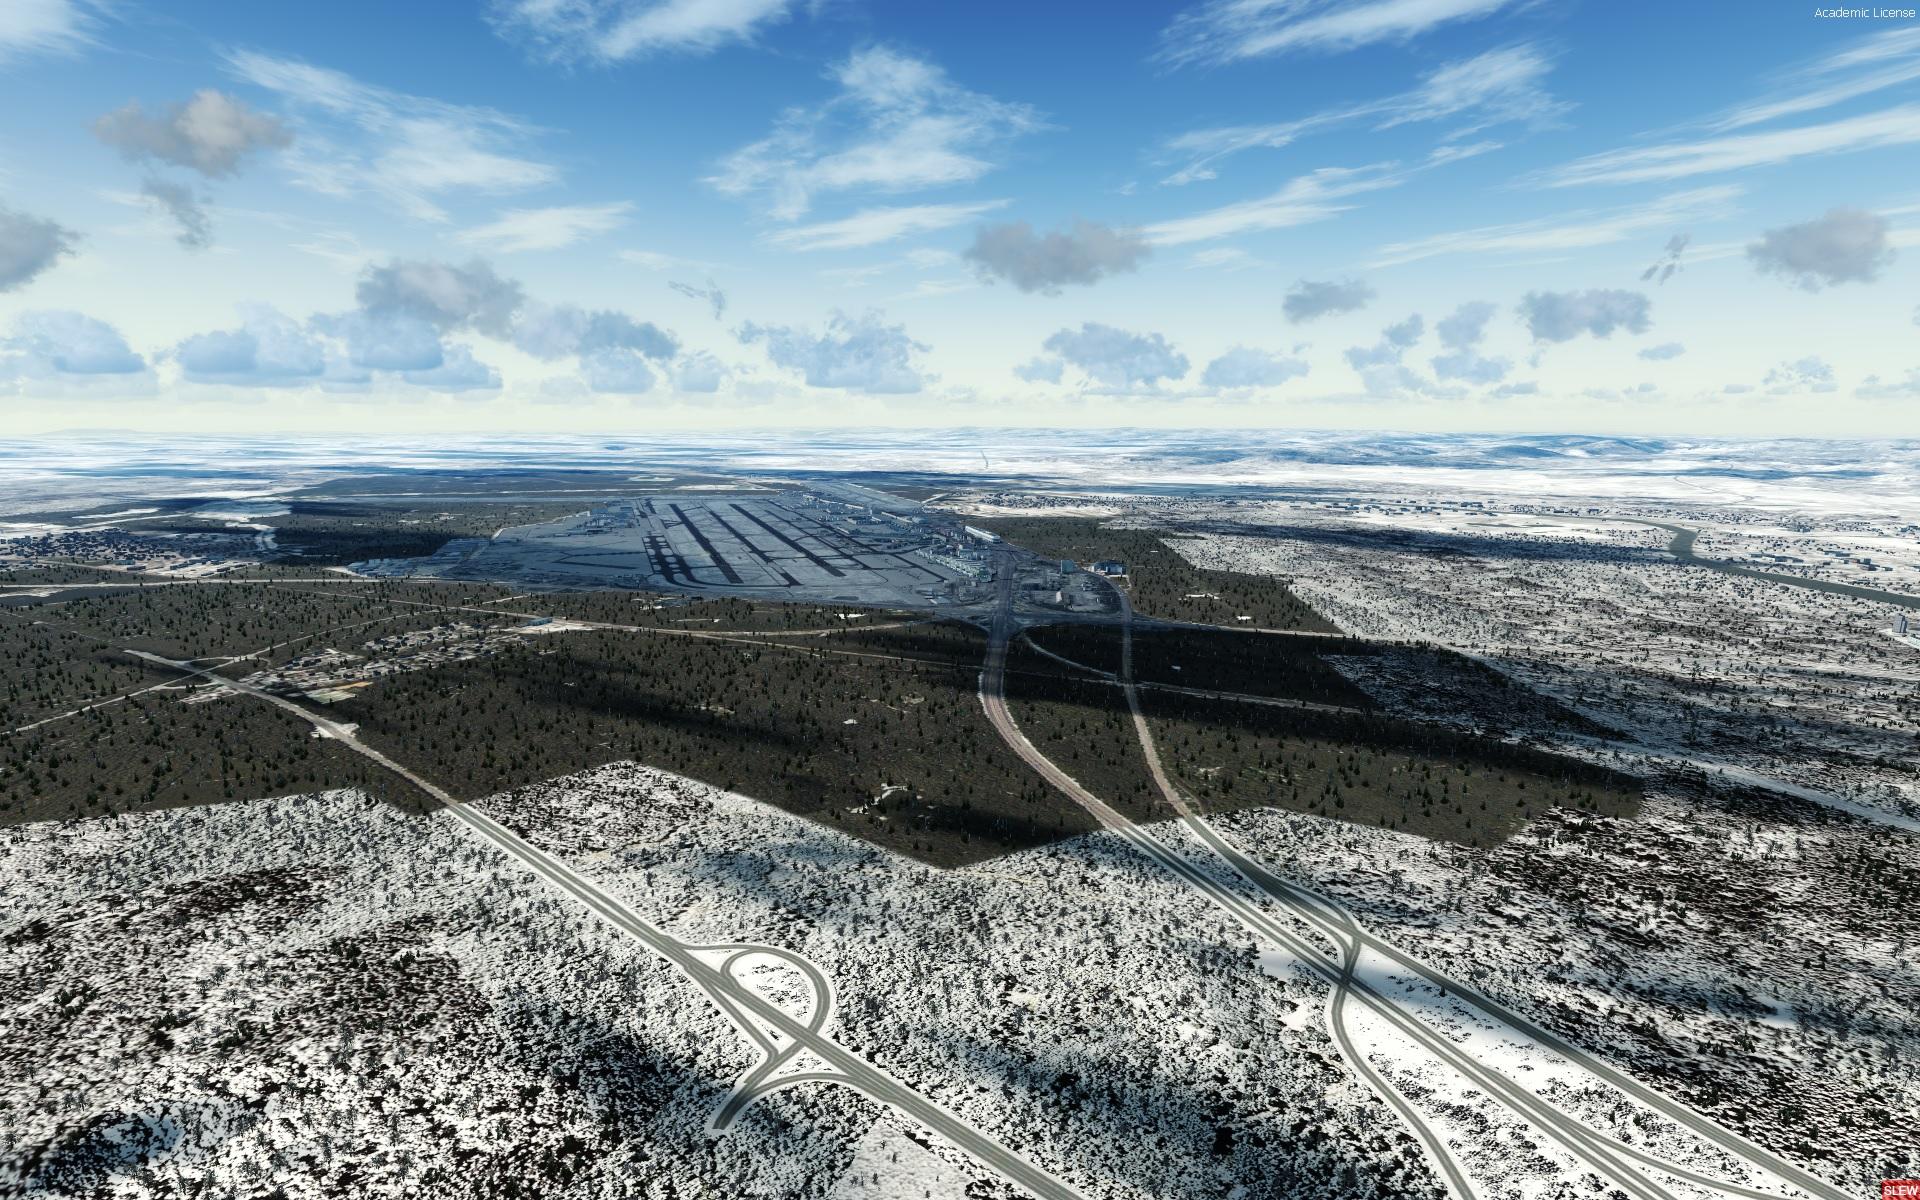 EDDF ground color - Aerosoft Mega Airports - AEROSOFT COMMUNITY SERVICES